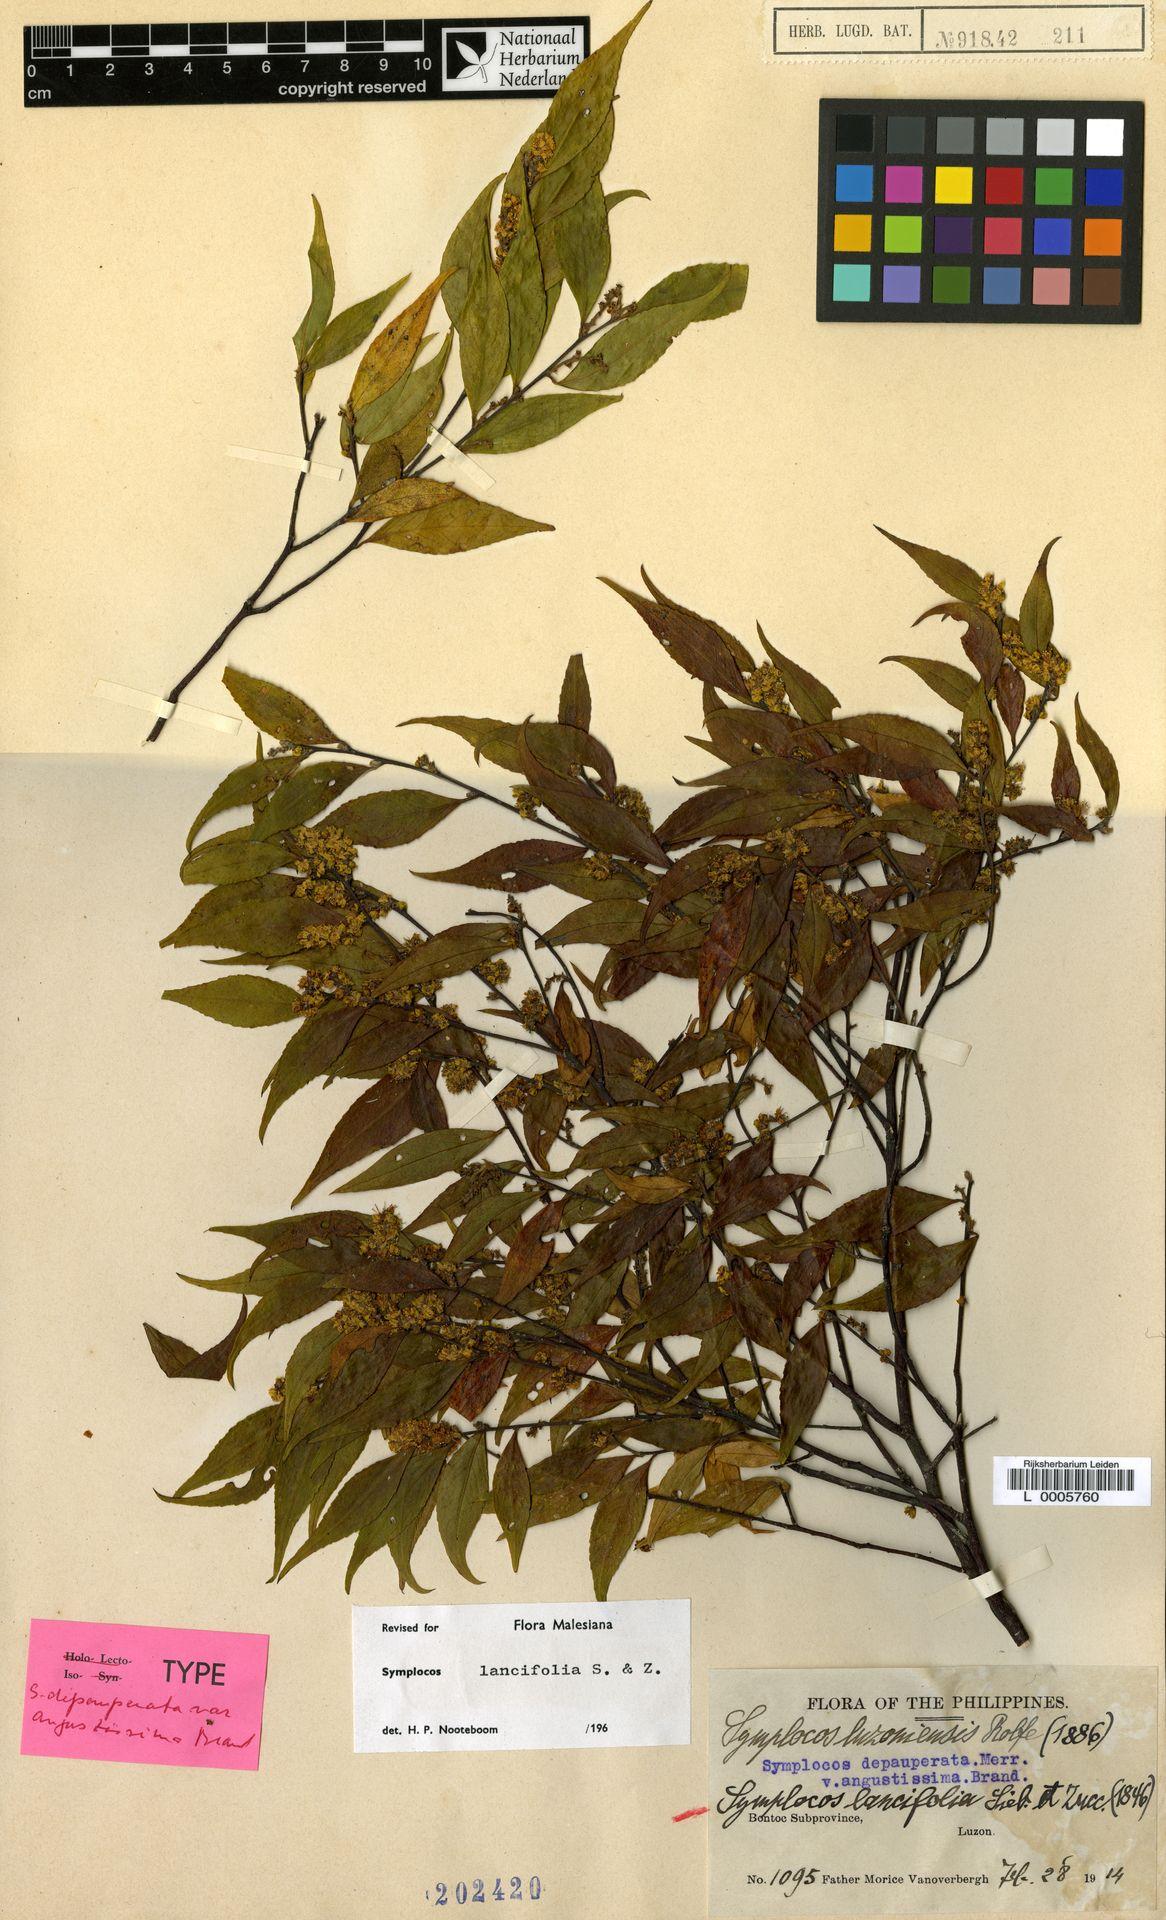 L  0005760 | Symplocos lancifolia Siebold & Zucc.